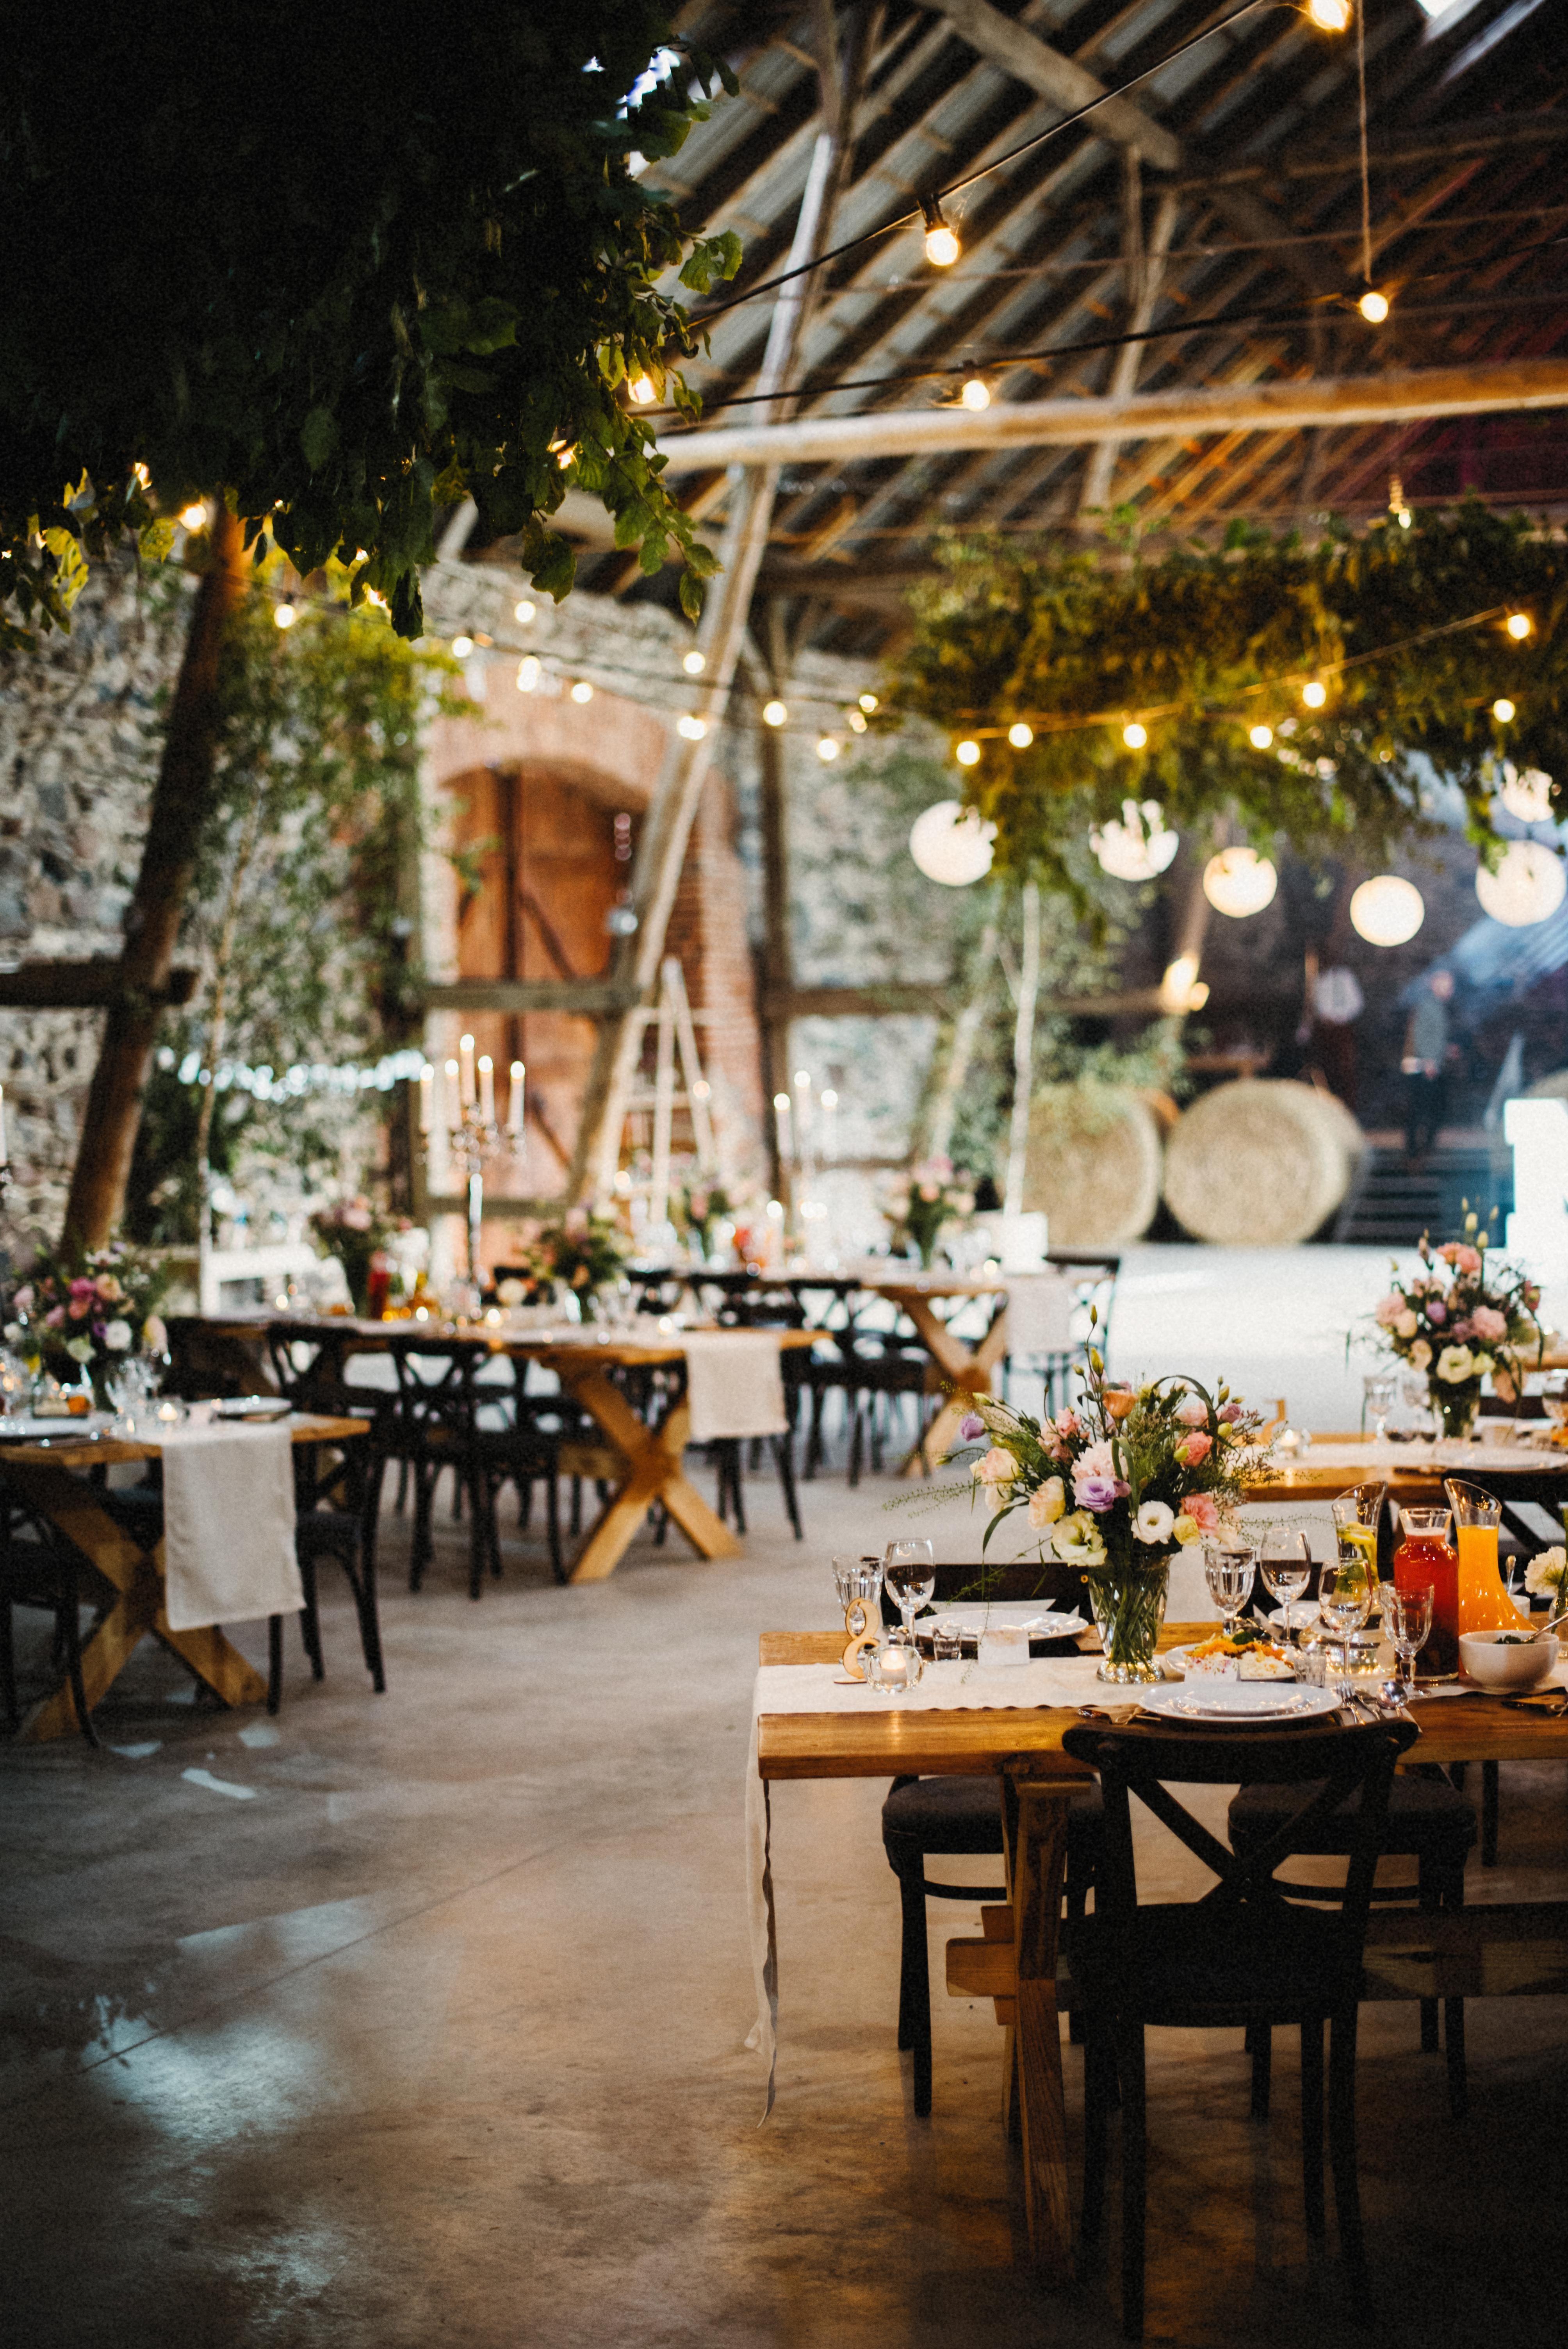 Inna Studiorustic Wedding Wedding In The Barn Wedding In The